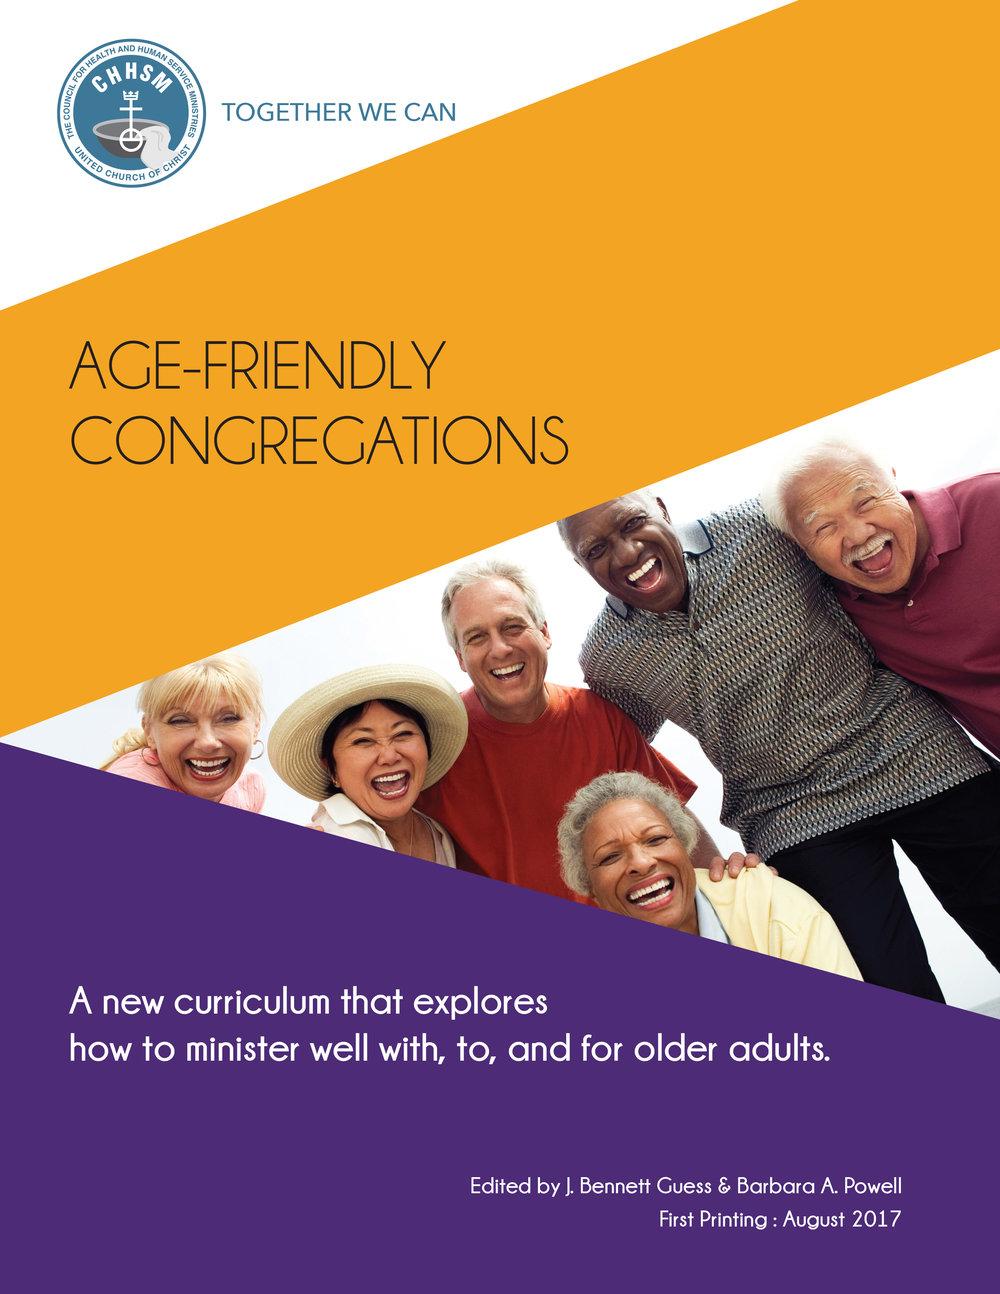 agefriendlyfordownload-1.jpg